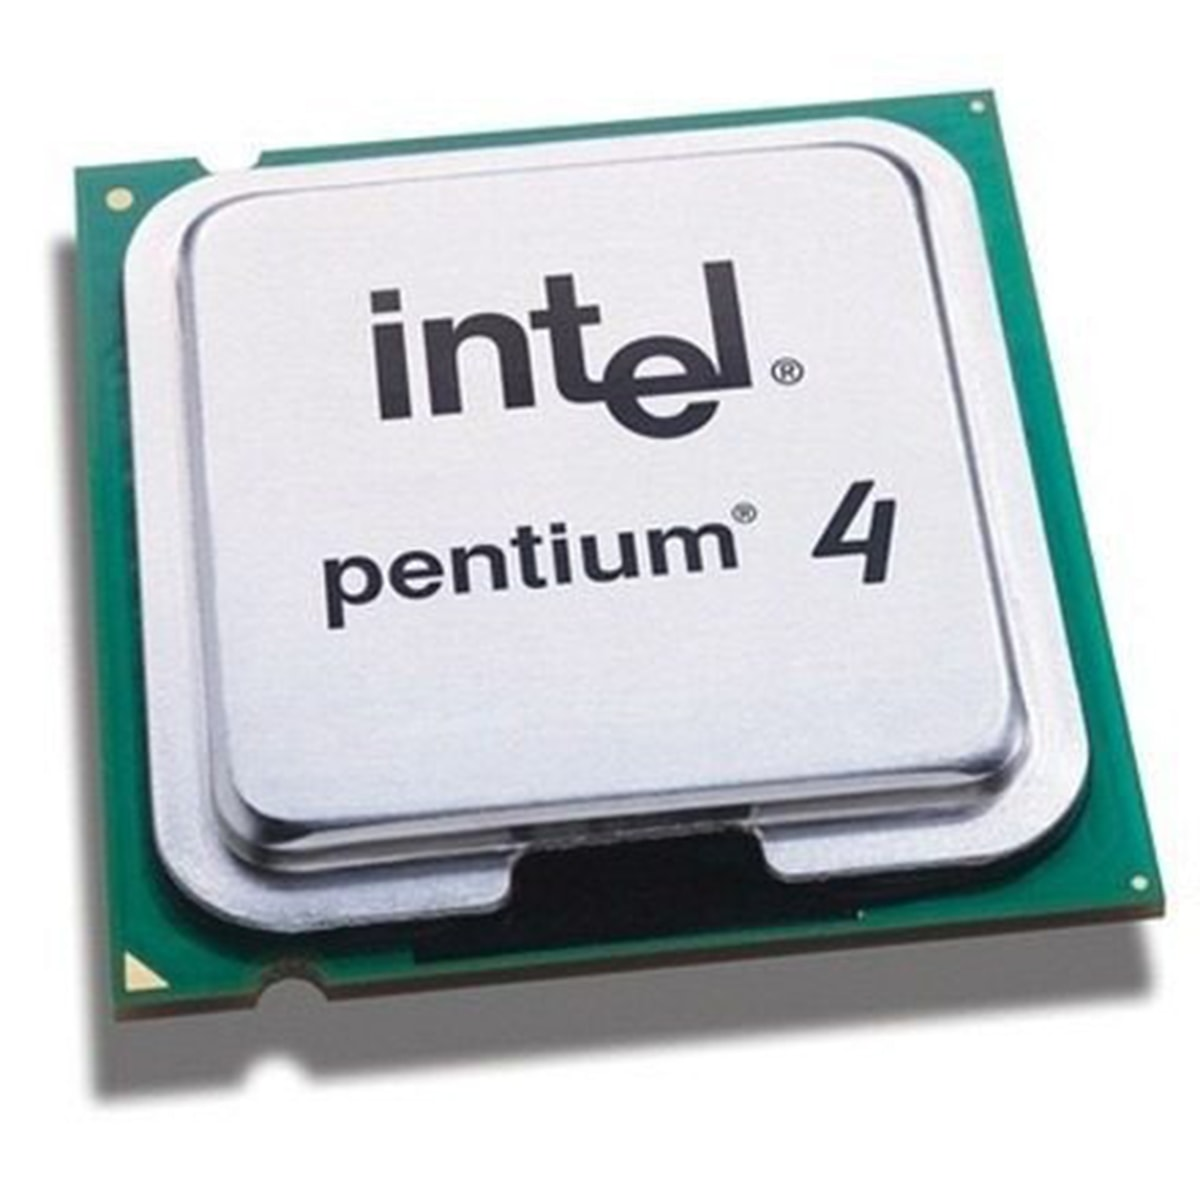 Processador Intel Pentium 4 HT 530 1M Cache / 3.00 GHz / 800 MHz / Socket 775 - Seminovo